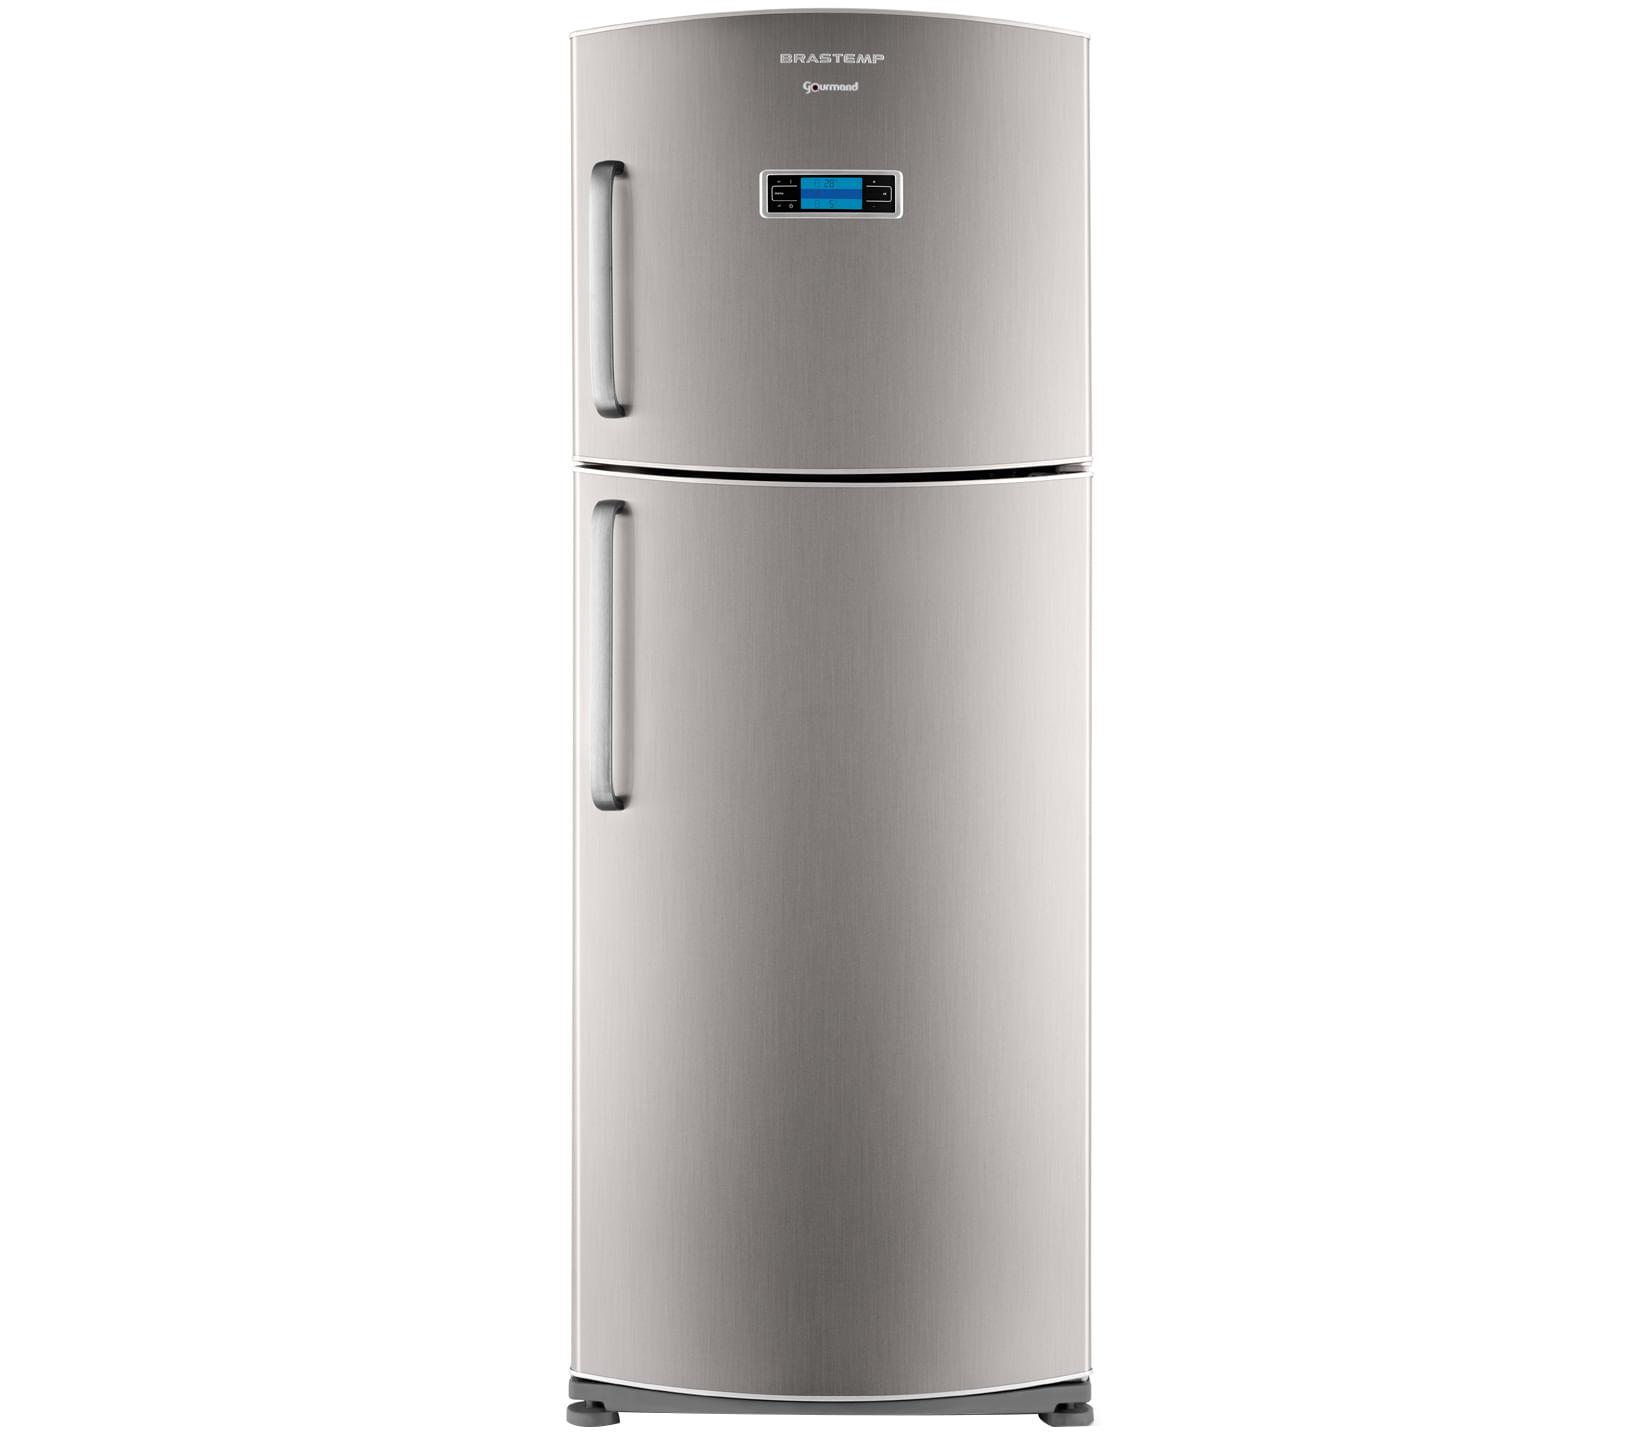 Geladeira Brastemp Gourmand Frost Free 432 Litros